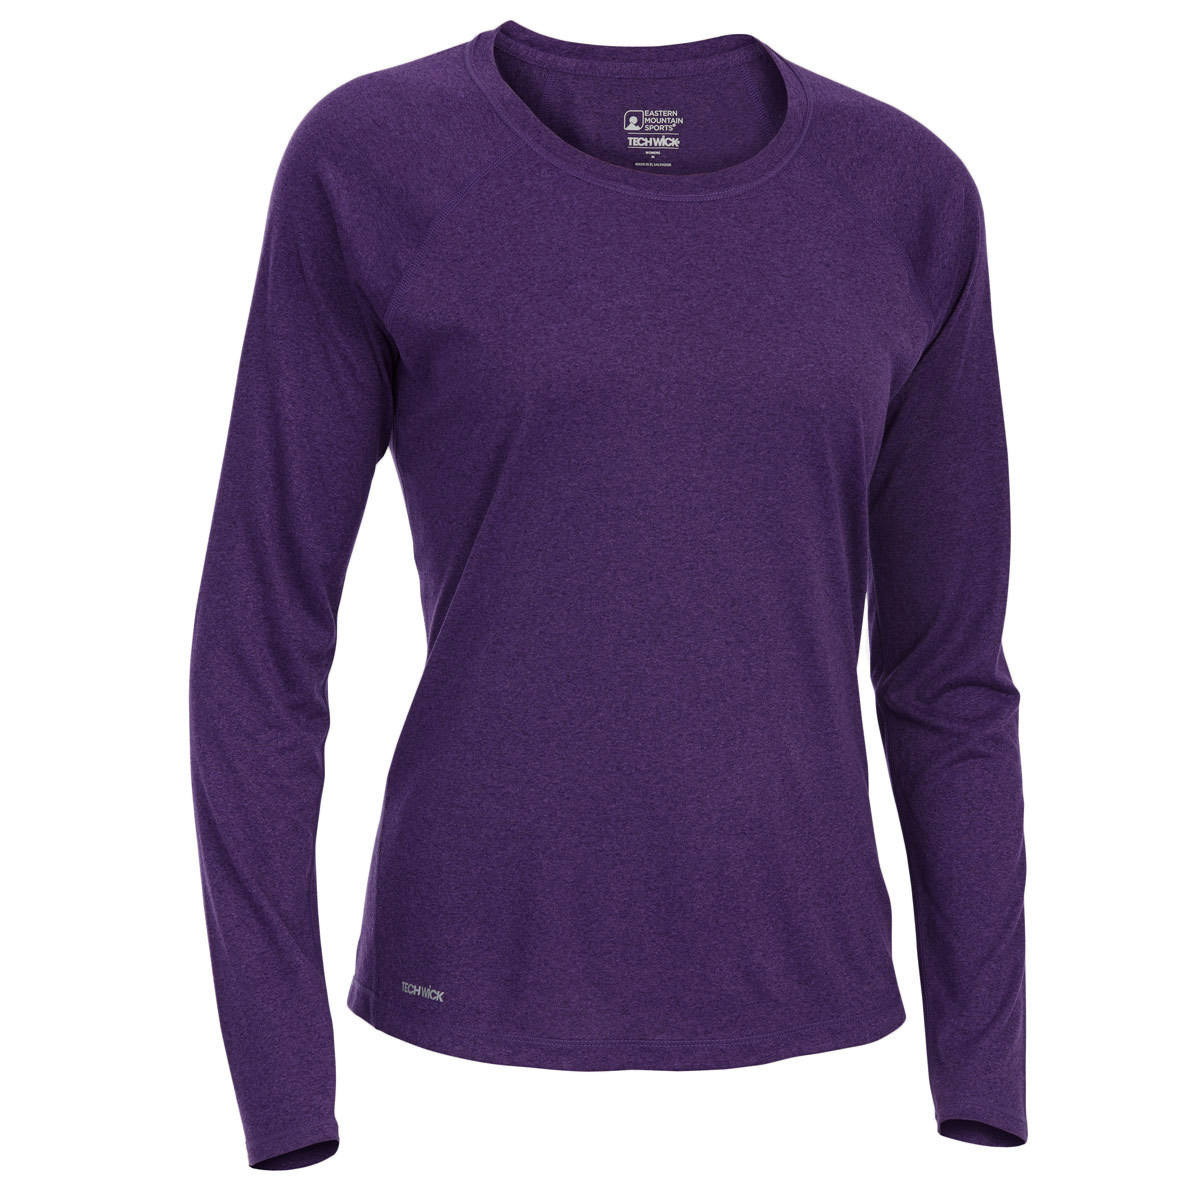 Ems Women's Techwick Essence Crew Long-Sleeve Shirt - Purple, XL